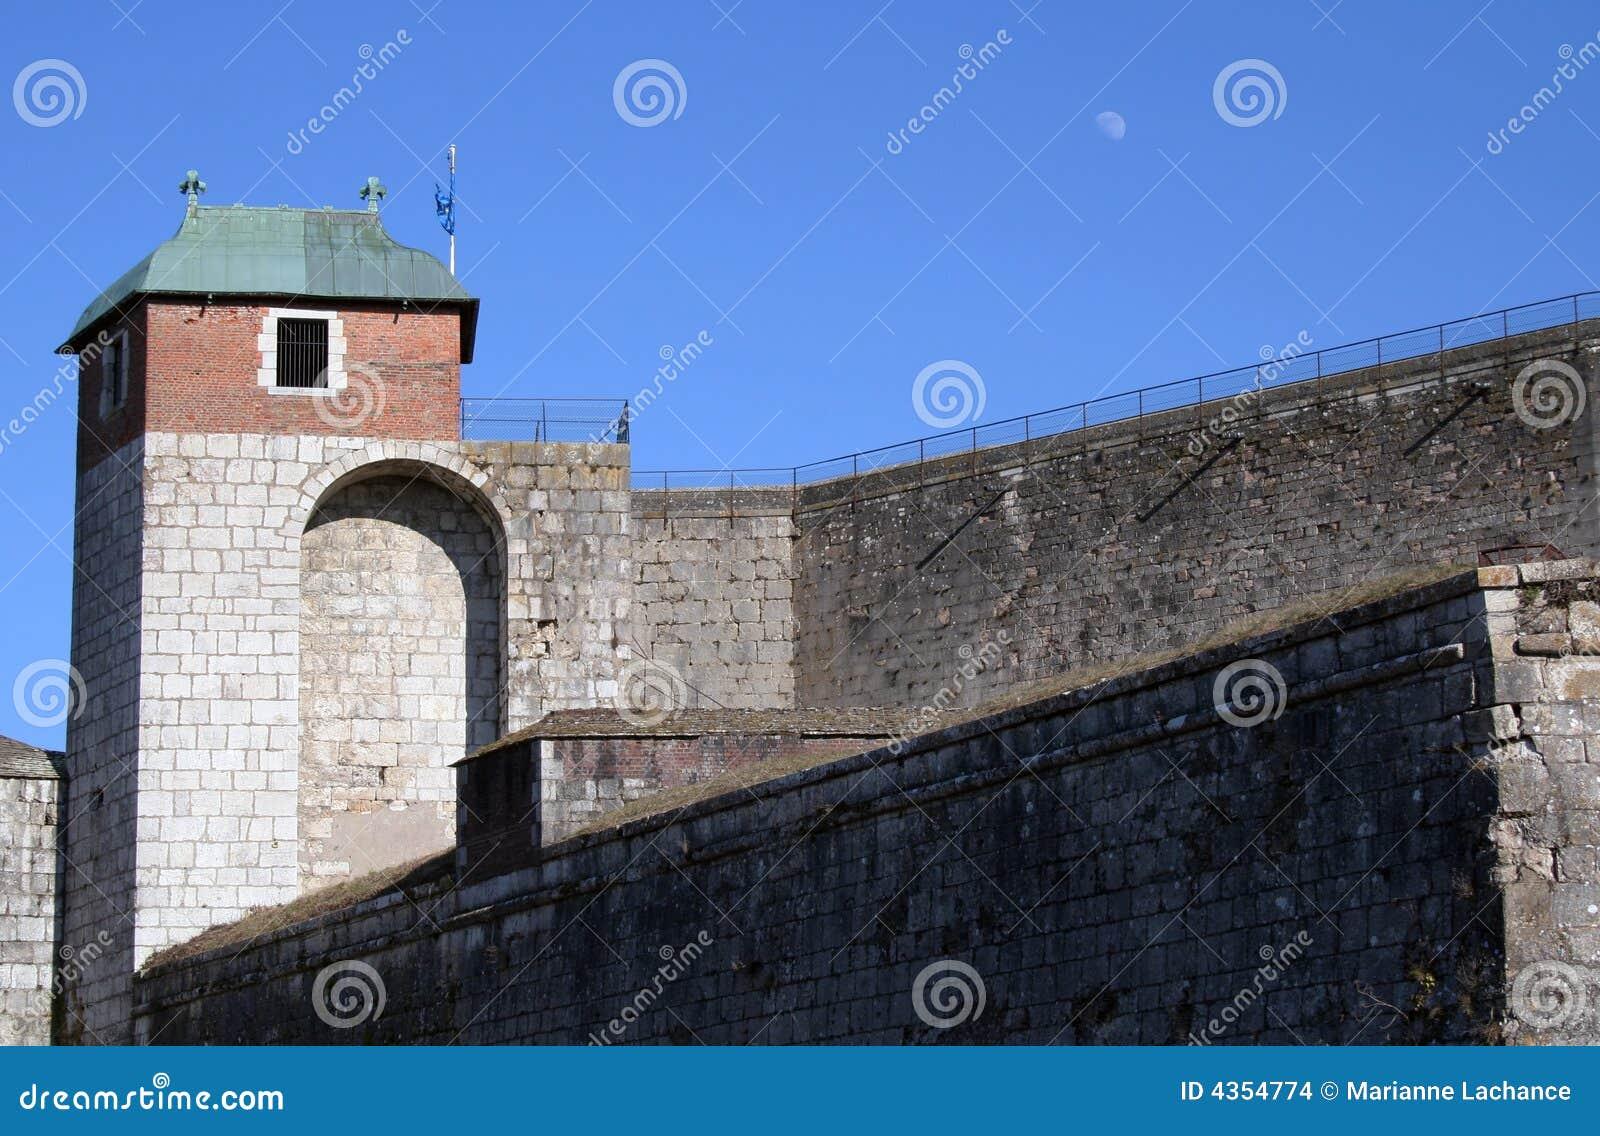 Besancon Fortress